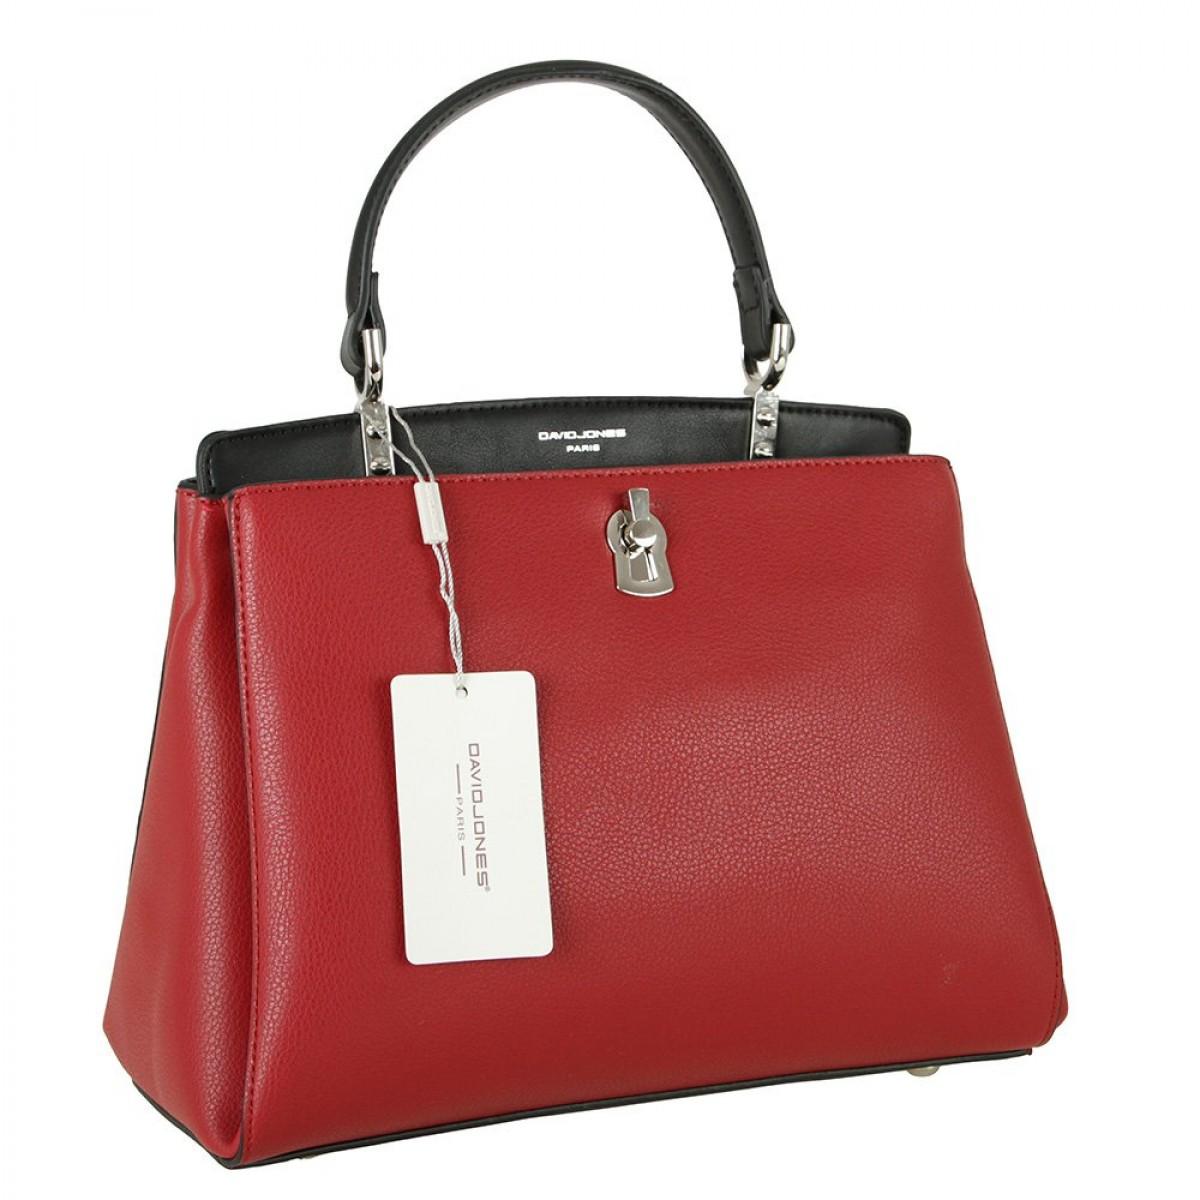 Жіноча сумка David Jones CM5905 RED